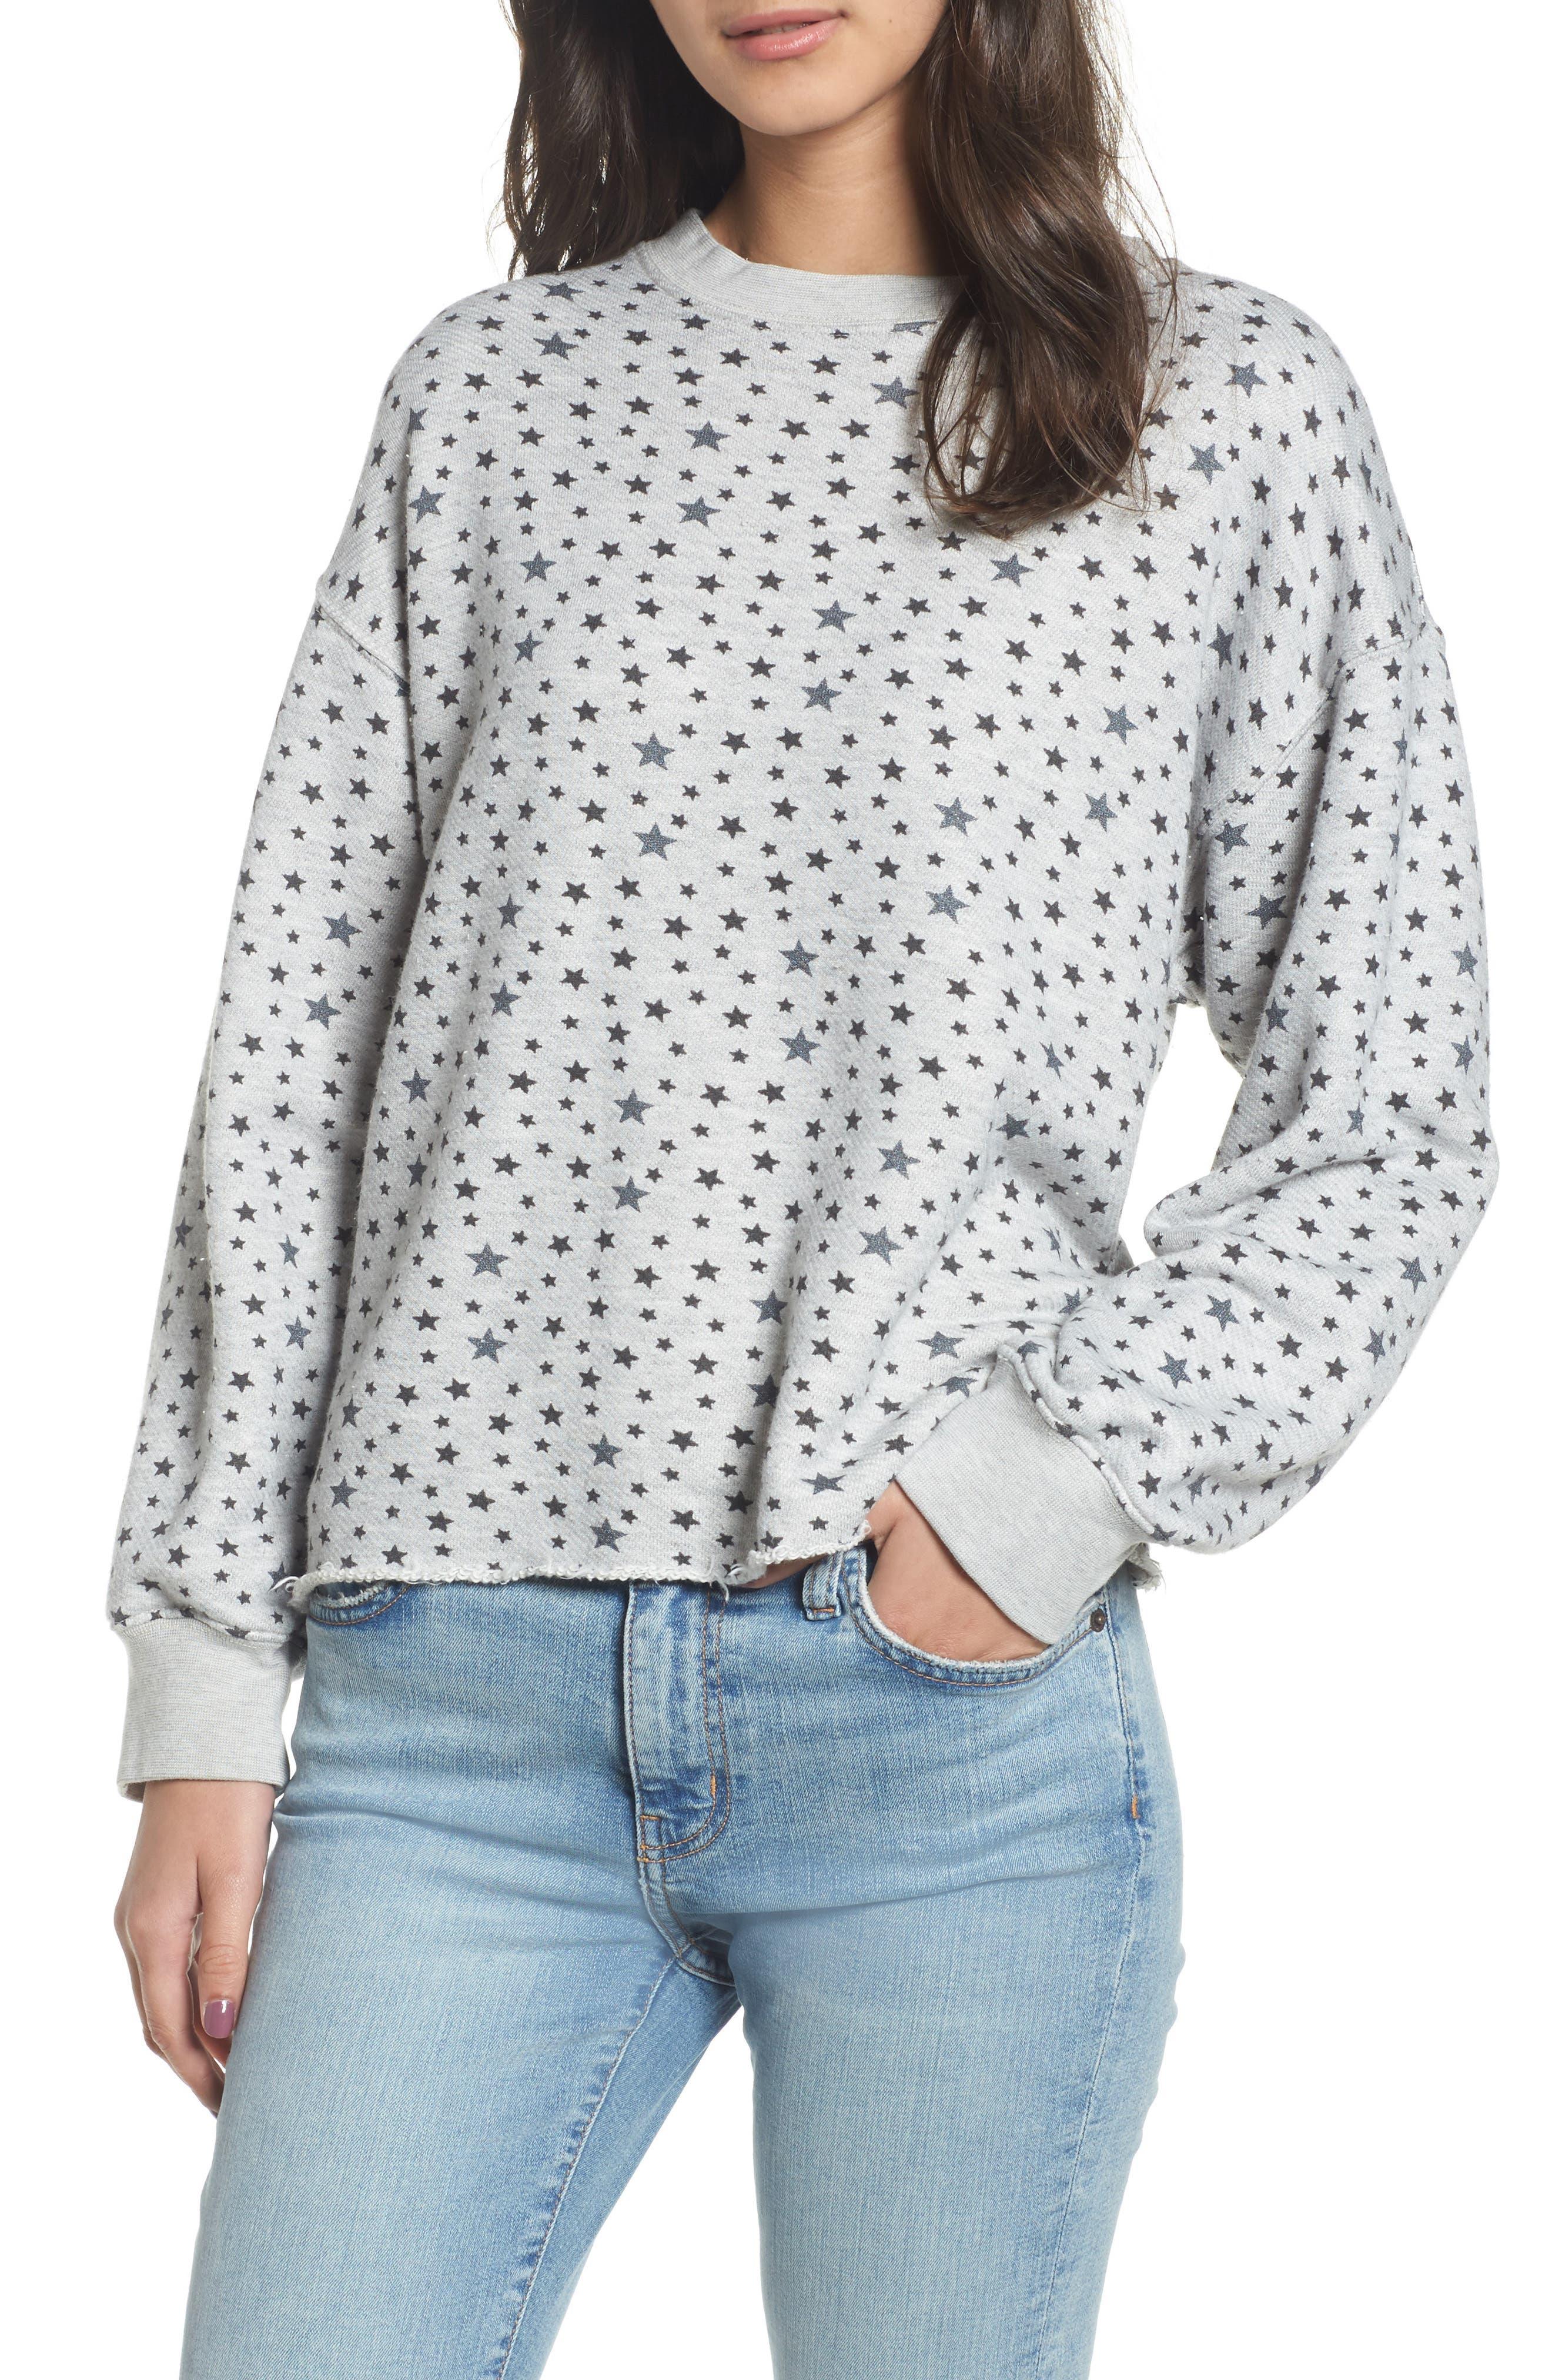 Main Image - Current/Elliott The Slouchy Crop Sweatshirt